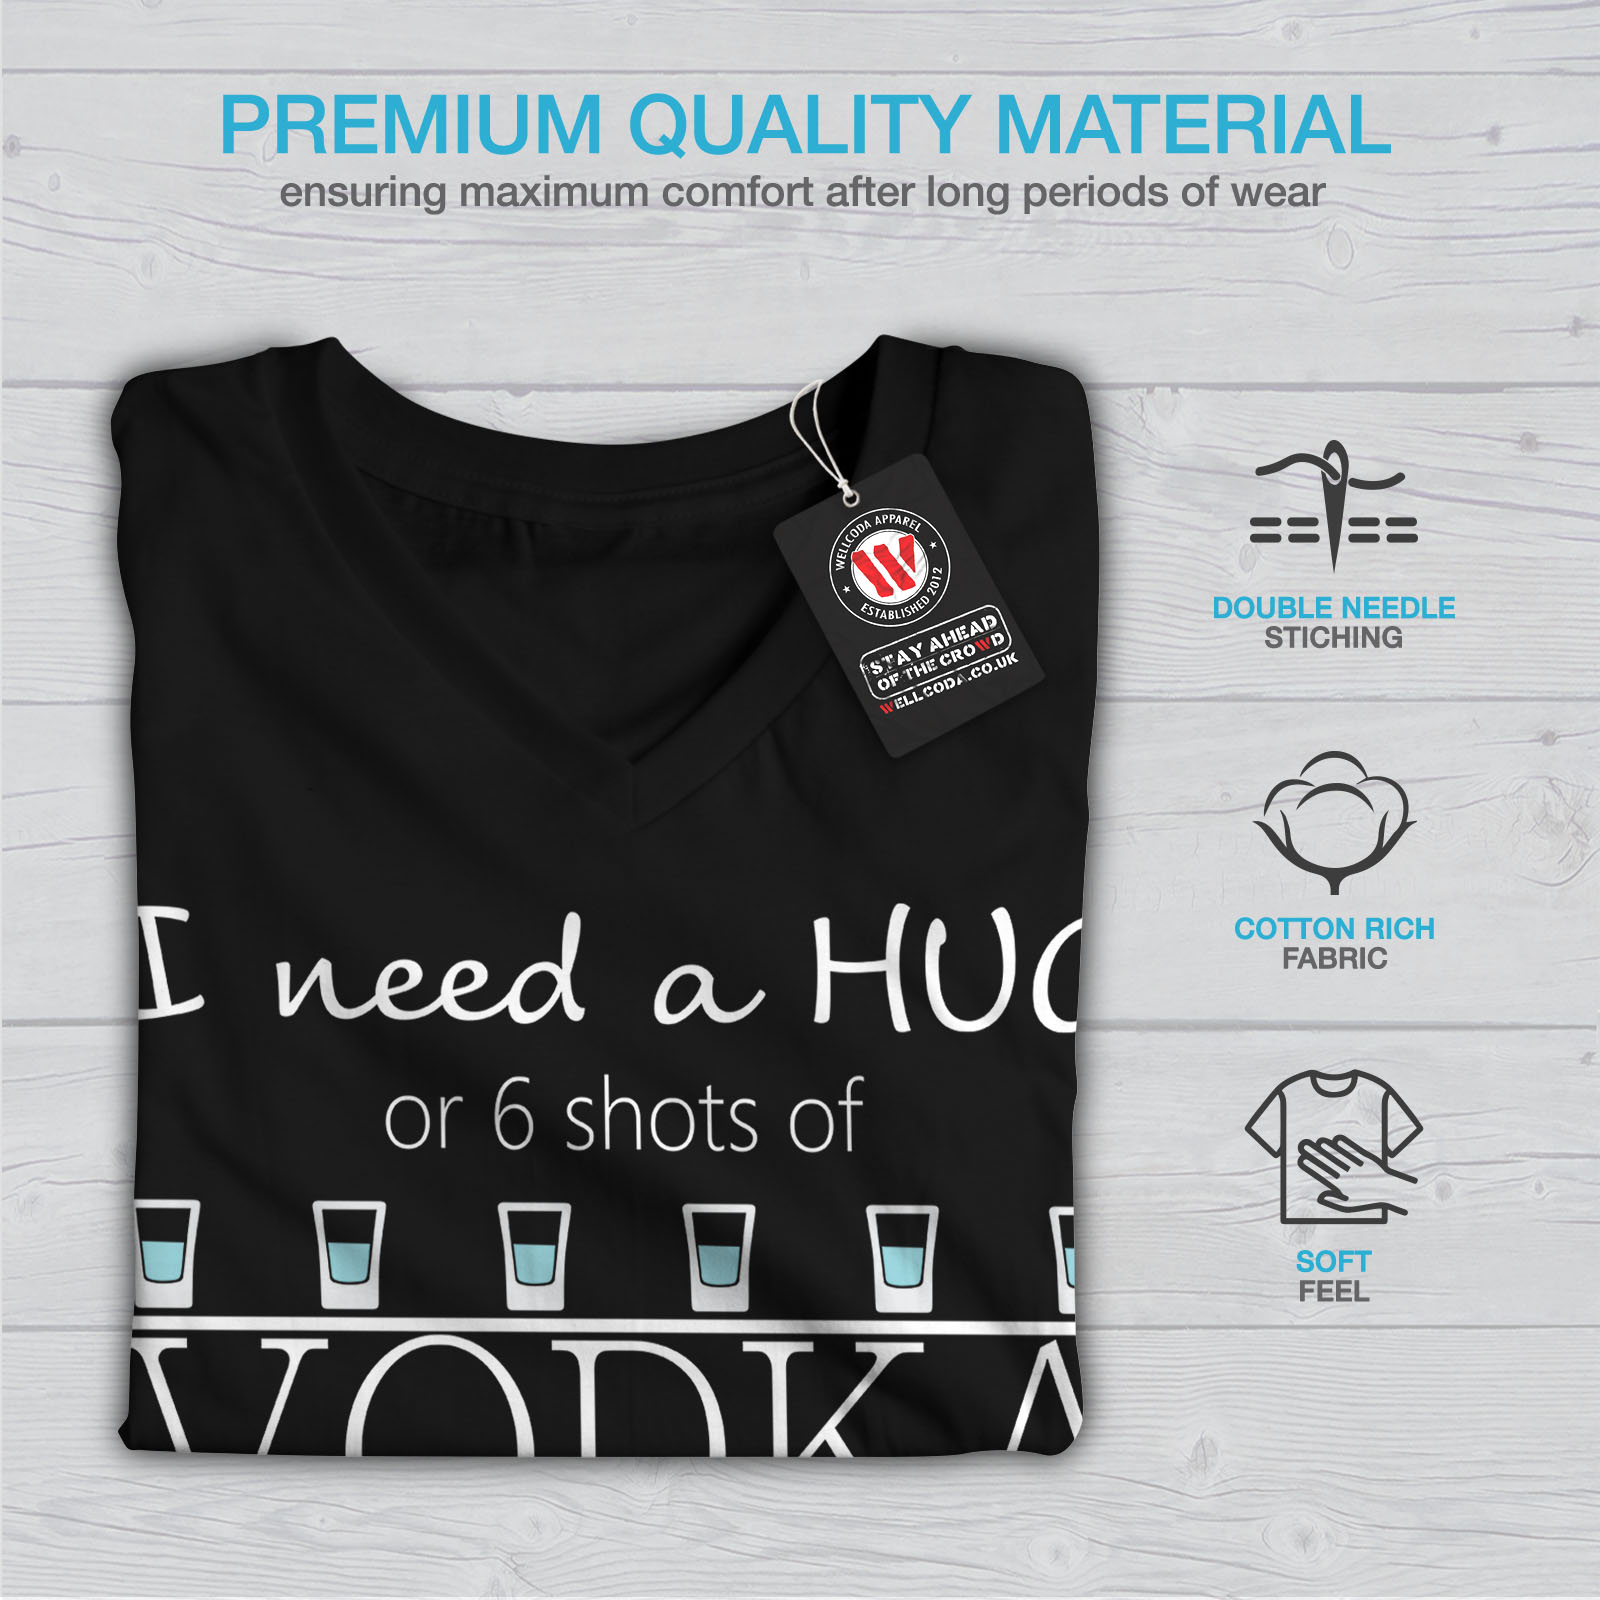 Wellcoda-Calin-ou-haut-femme-Vodka-T-Shirt-col-V-Drole-Citation-Design-Graphique-Tee miniature 5